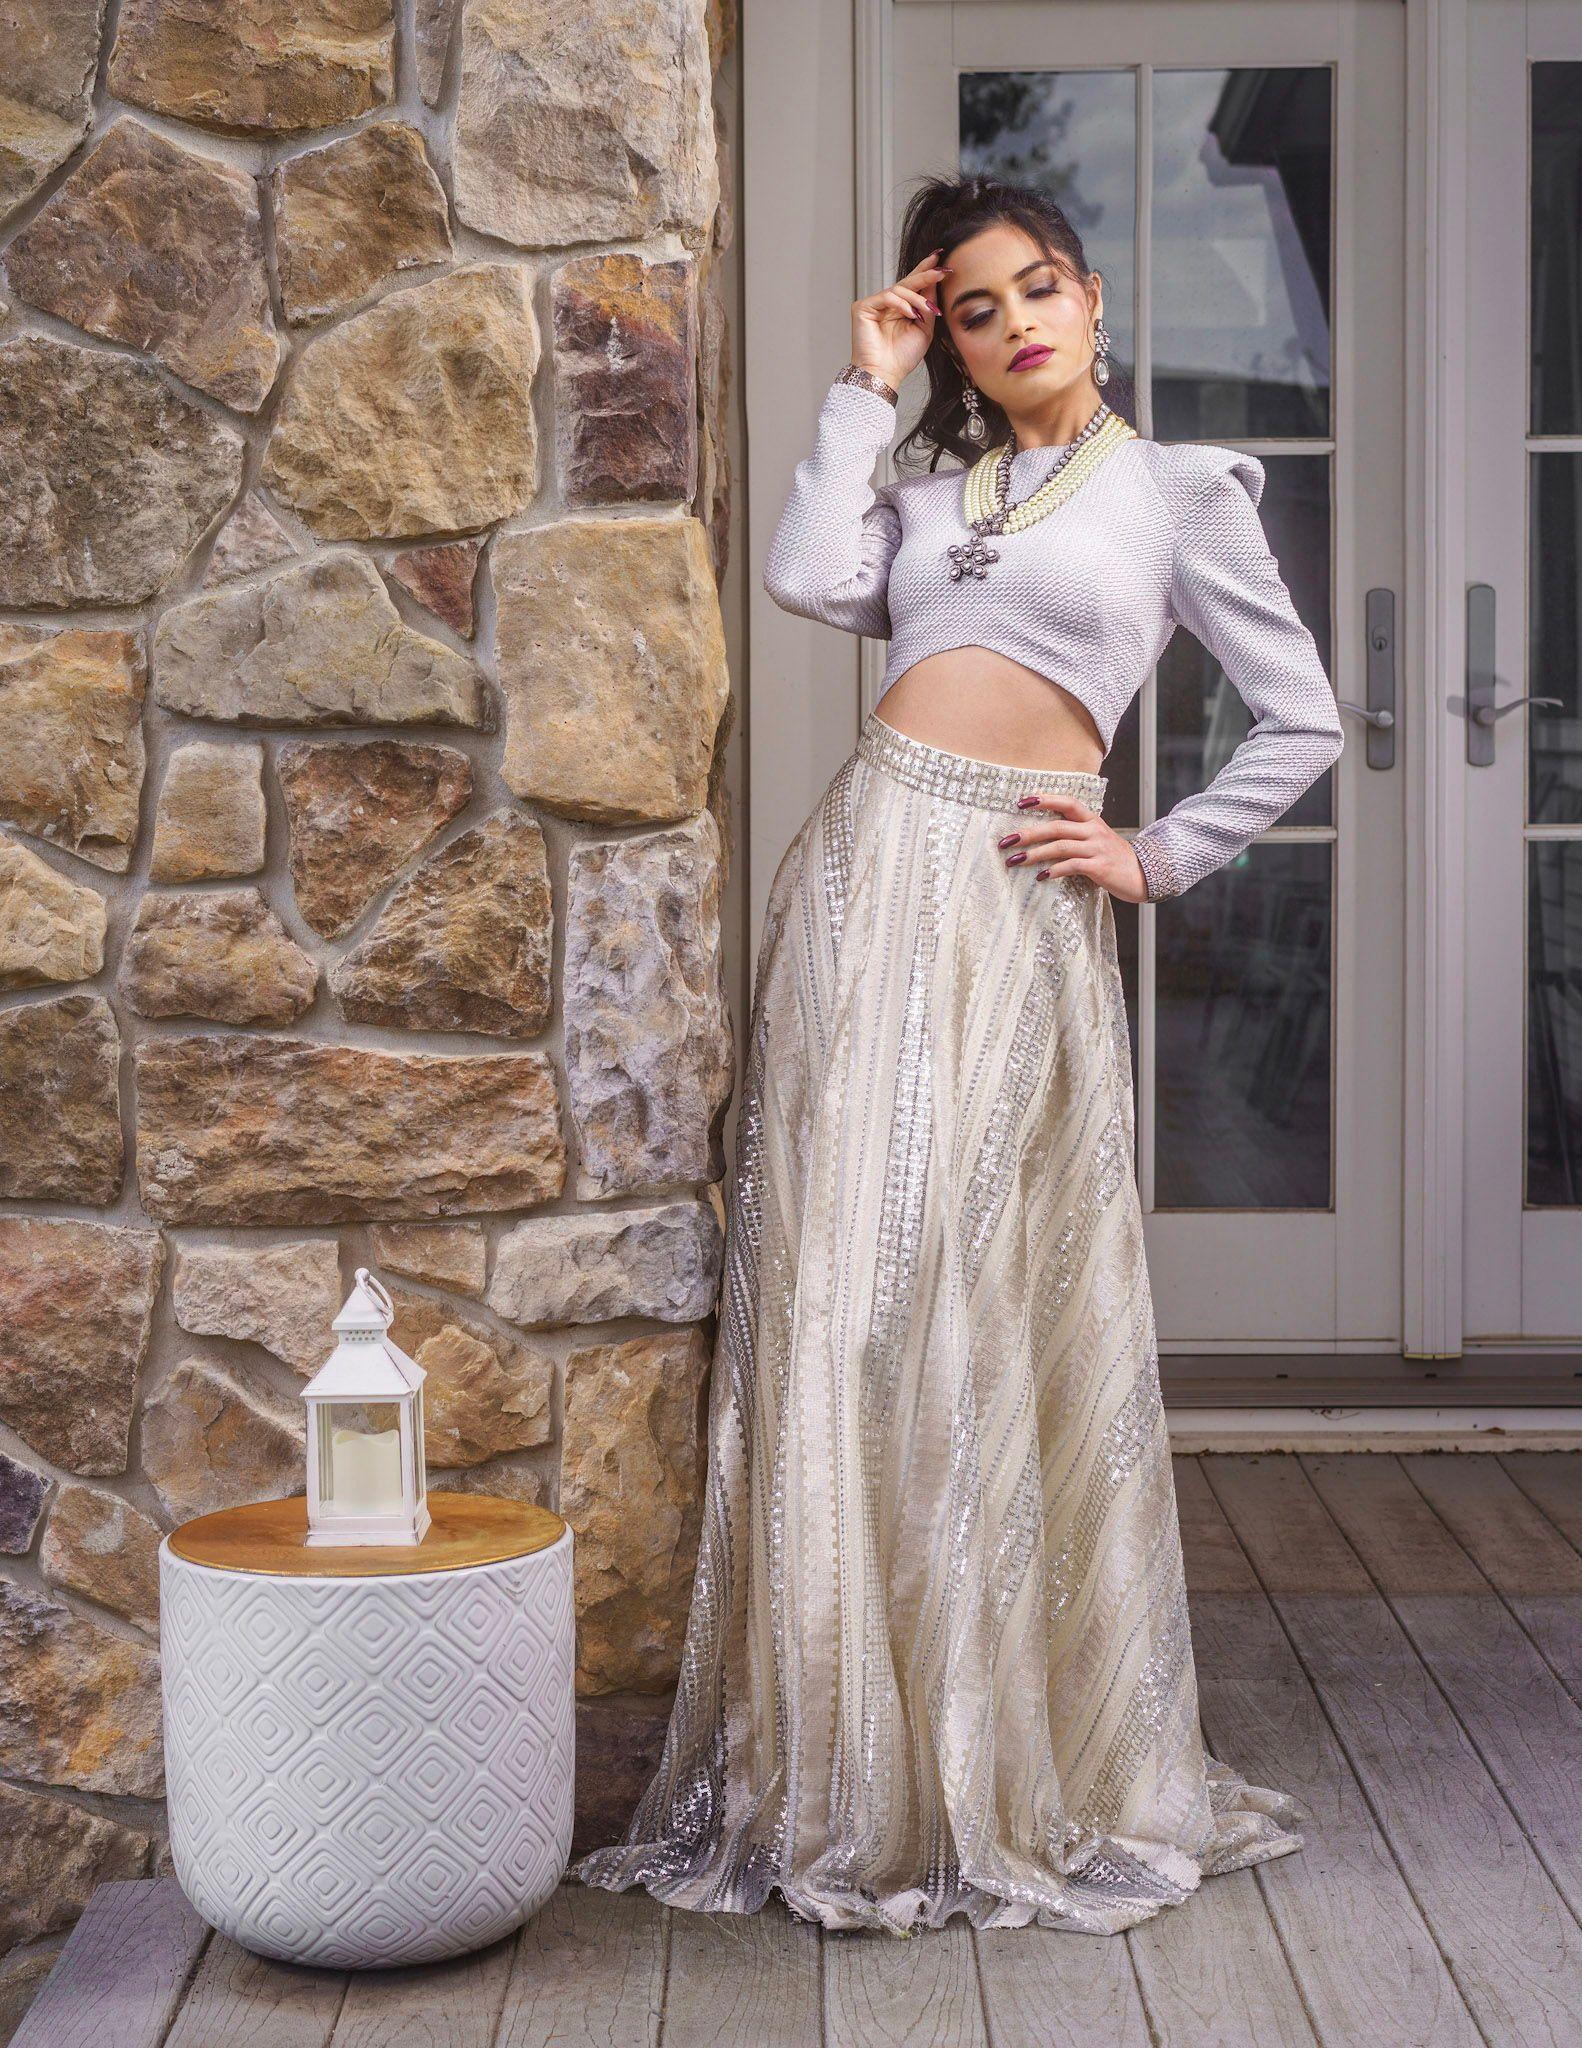 Winter White Lehenga Outfit